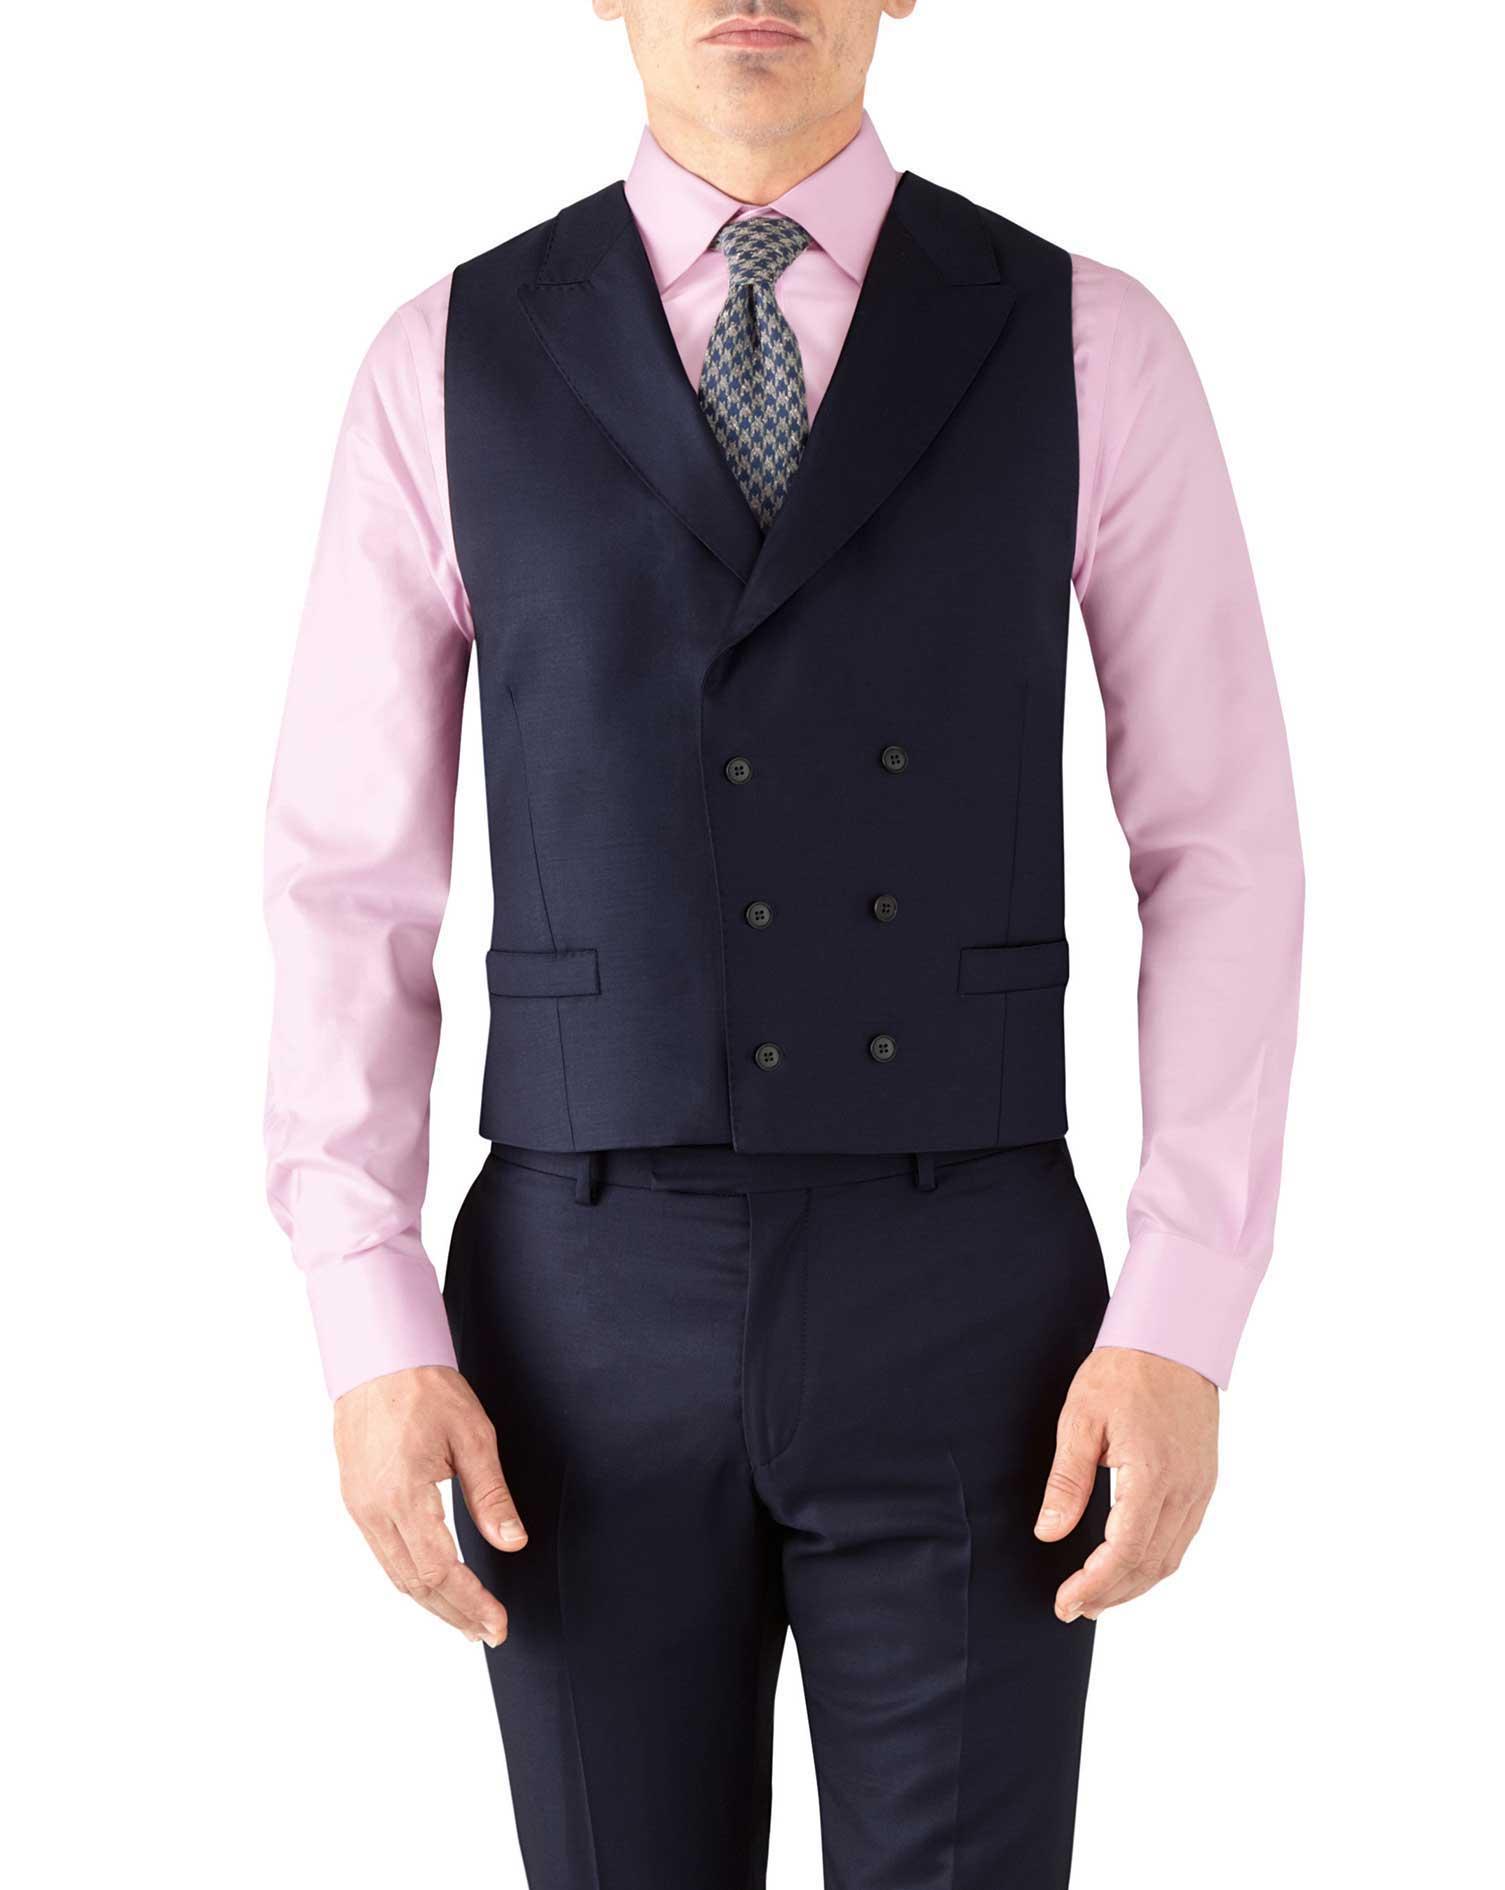 Navy Adjustable Fit Italian Twill Luxury Suit Wool Waistcoat Size w46 by Charles Tyrwhitt